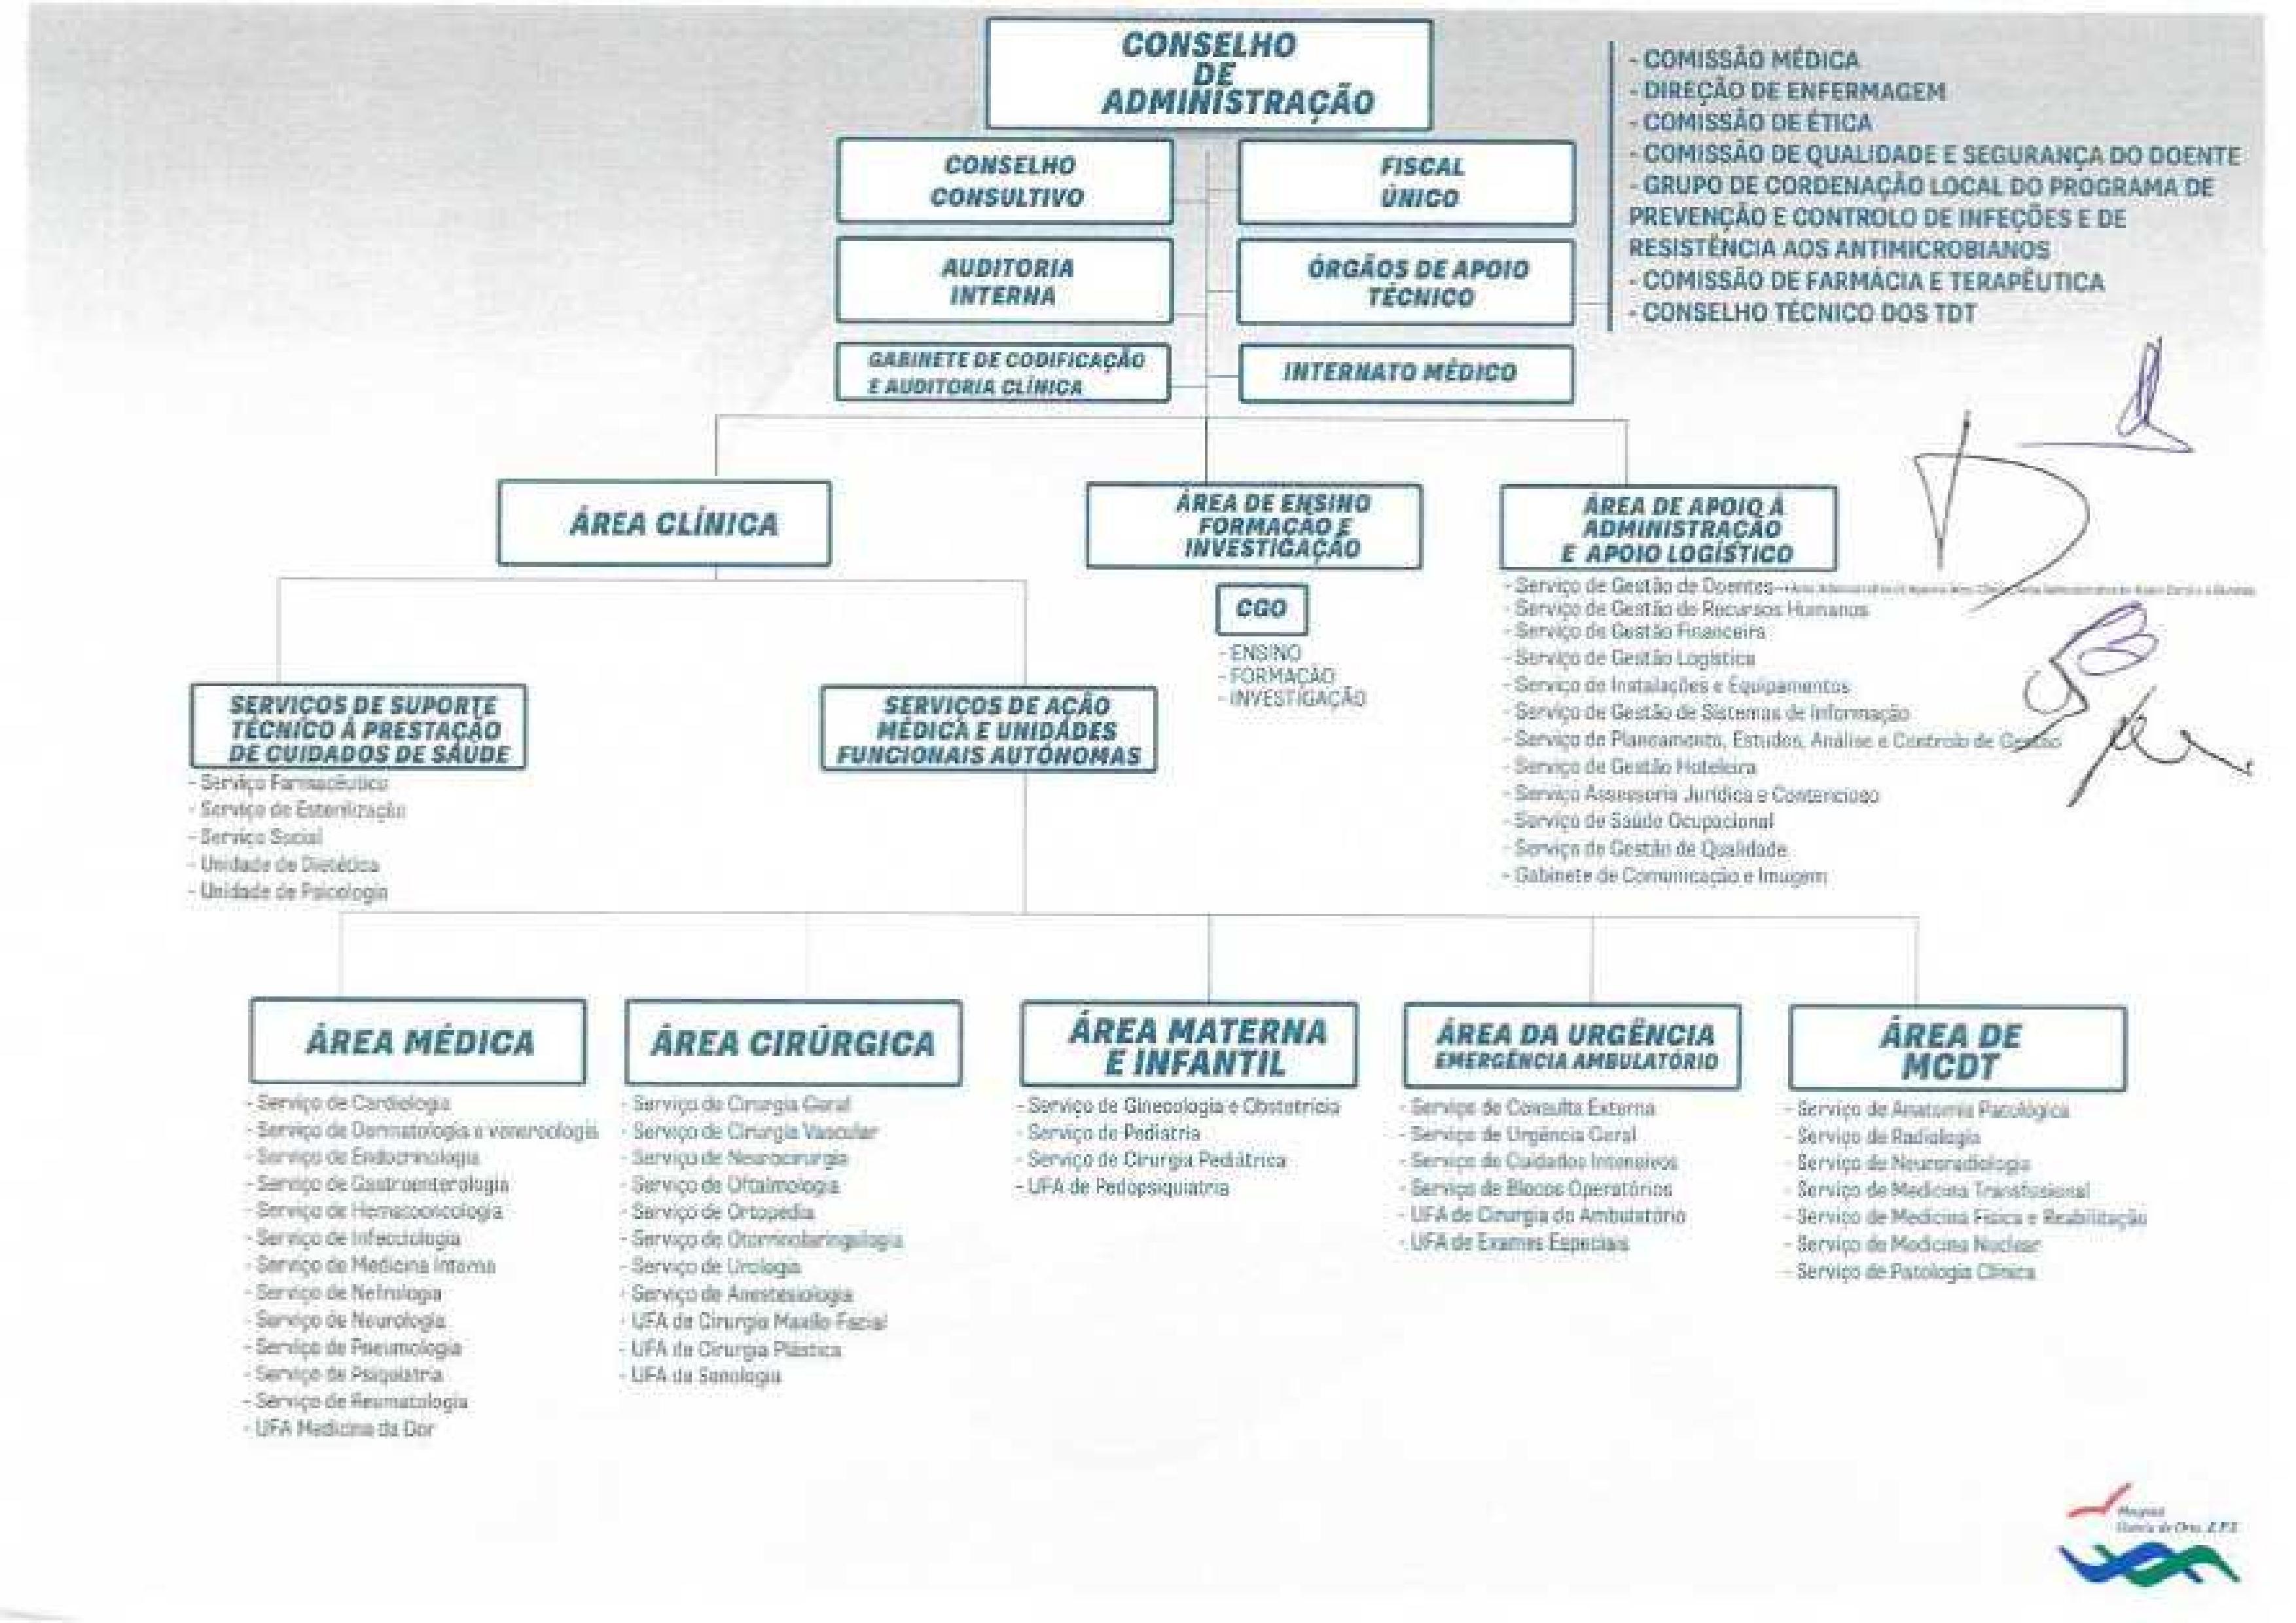 HospitalGarciadeOrta_Organograma-rotated (1)-page-001